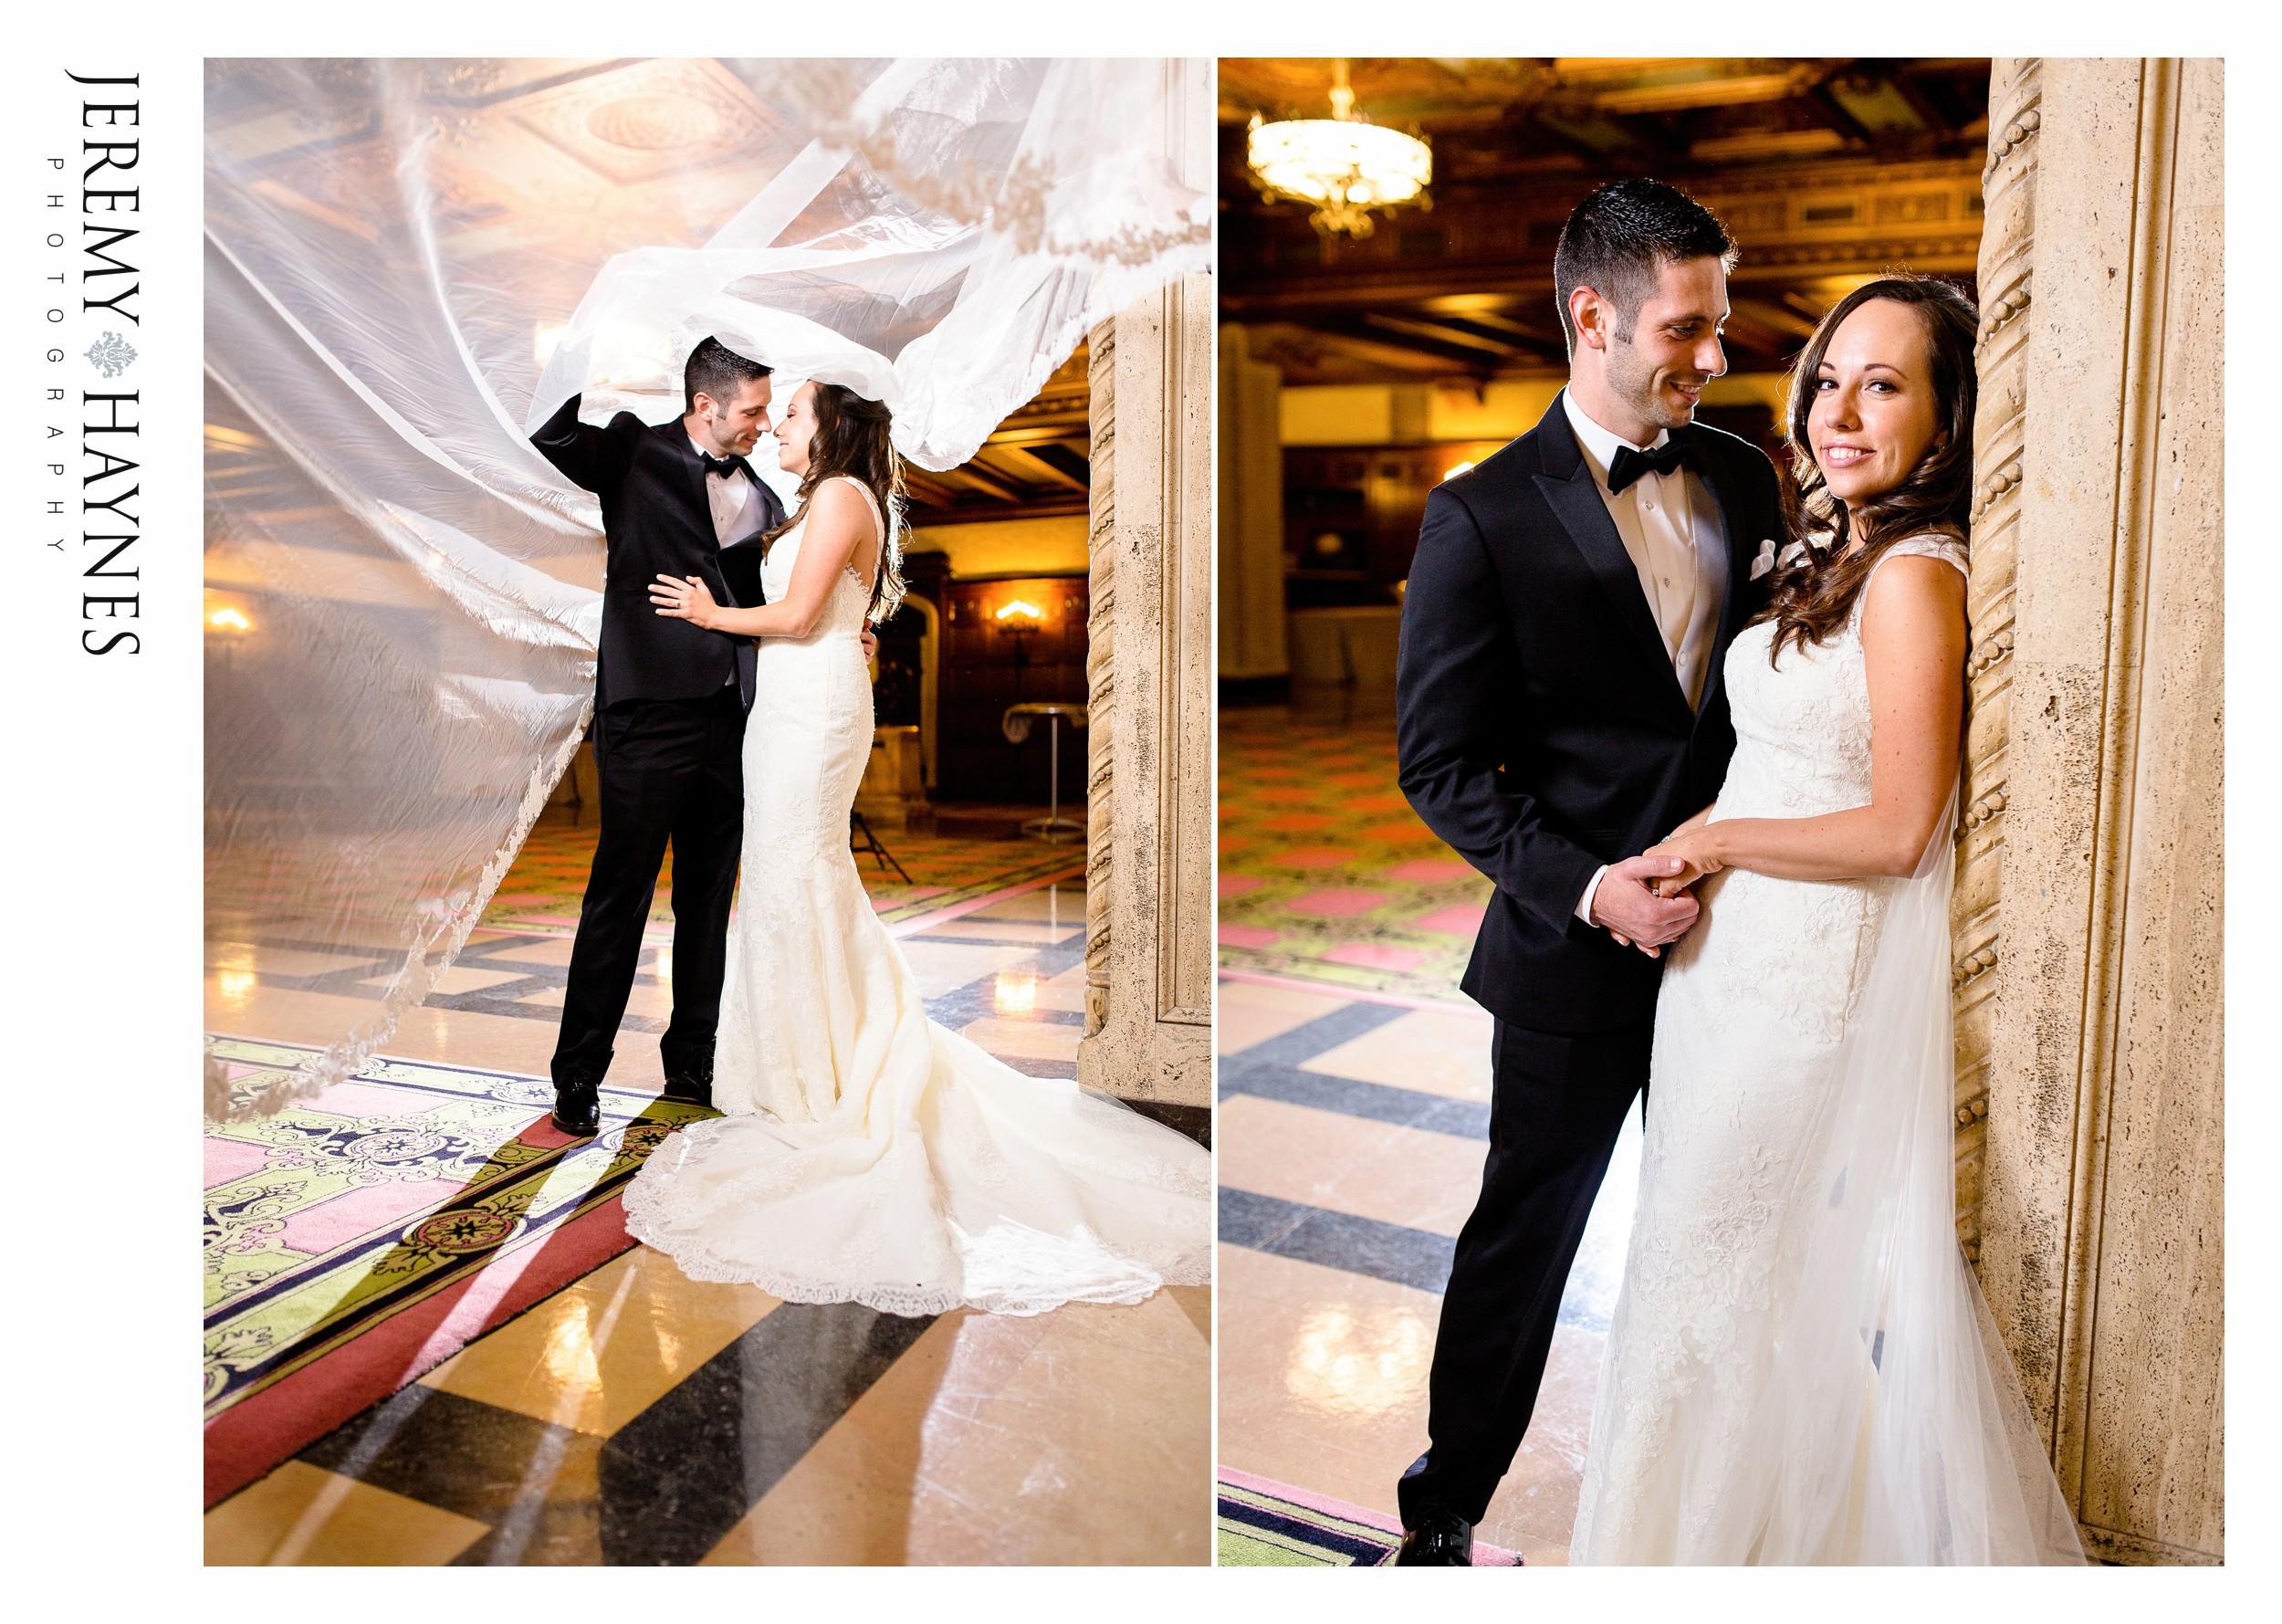 stunning-scottish-rite-cathedral-wedding-pictures.jpg